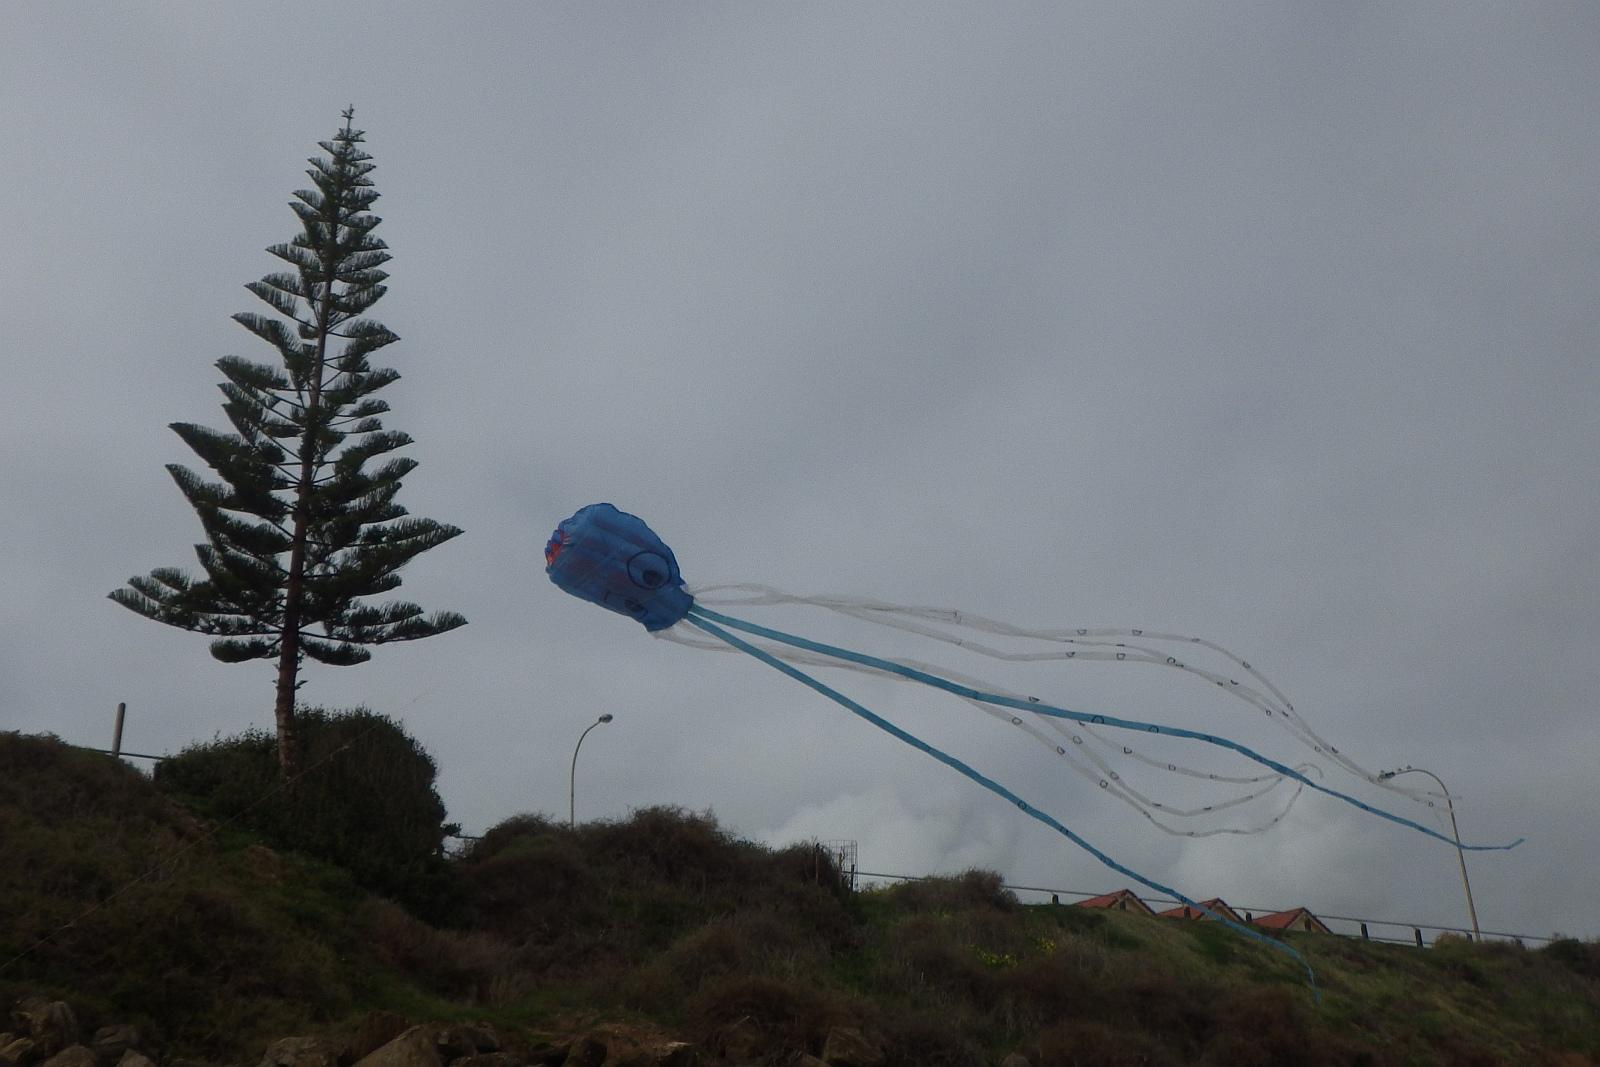 MBK Octopus kite 1 - 6.